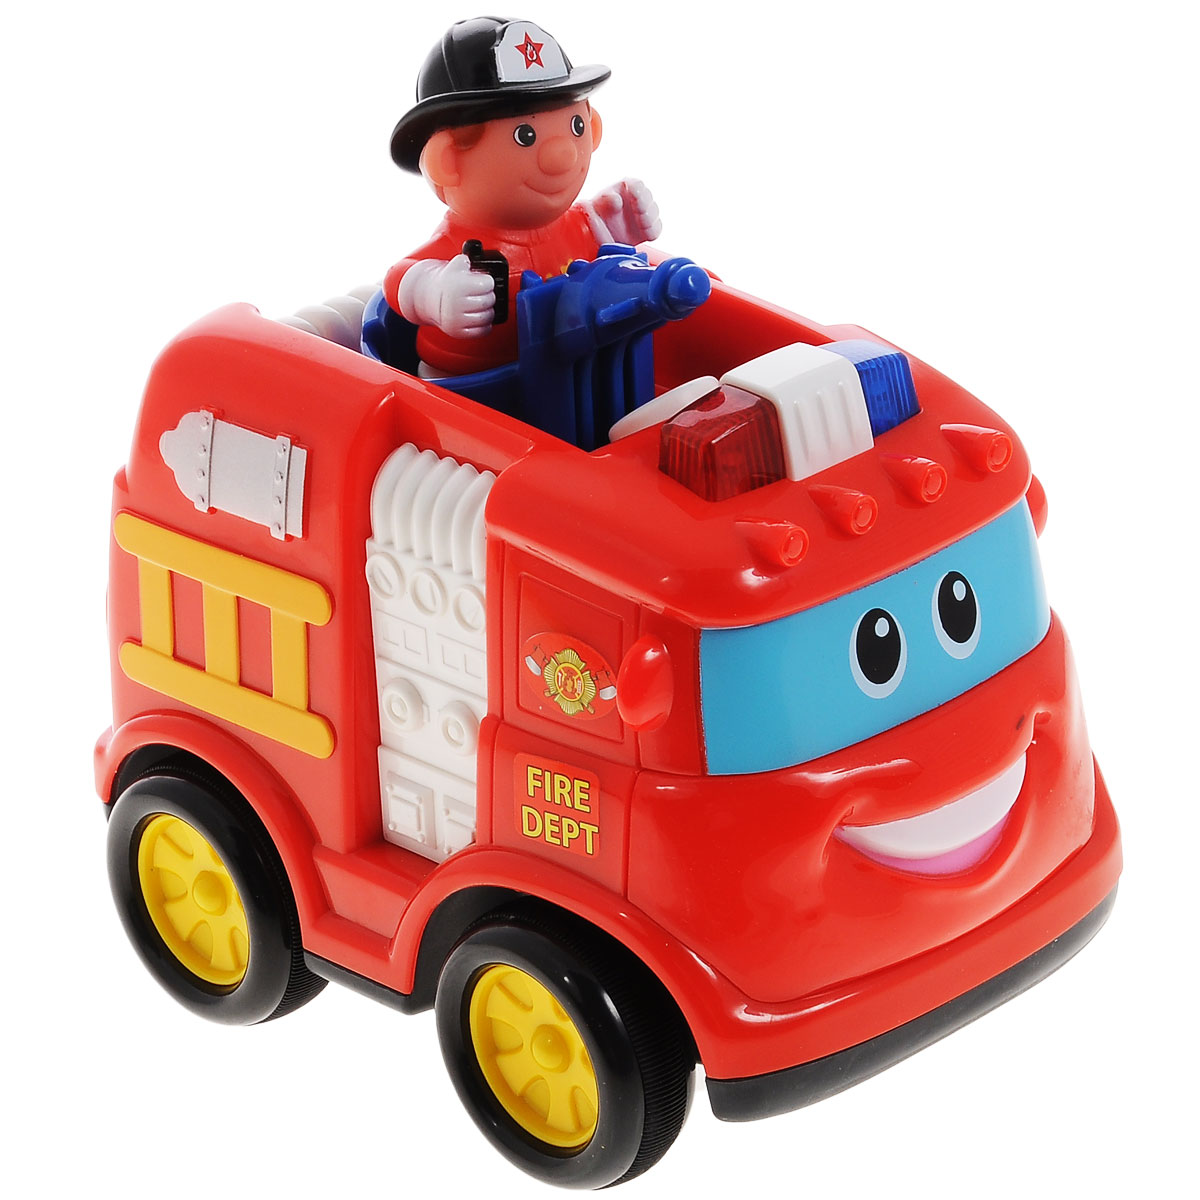 Kiddieland Развивающая игрушка Пожарная машина kiddieland развивающая игрушка забавная камера